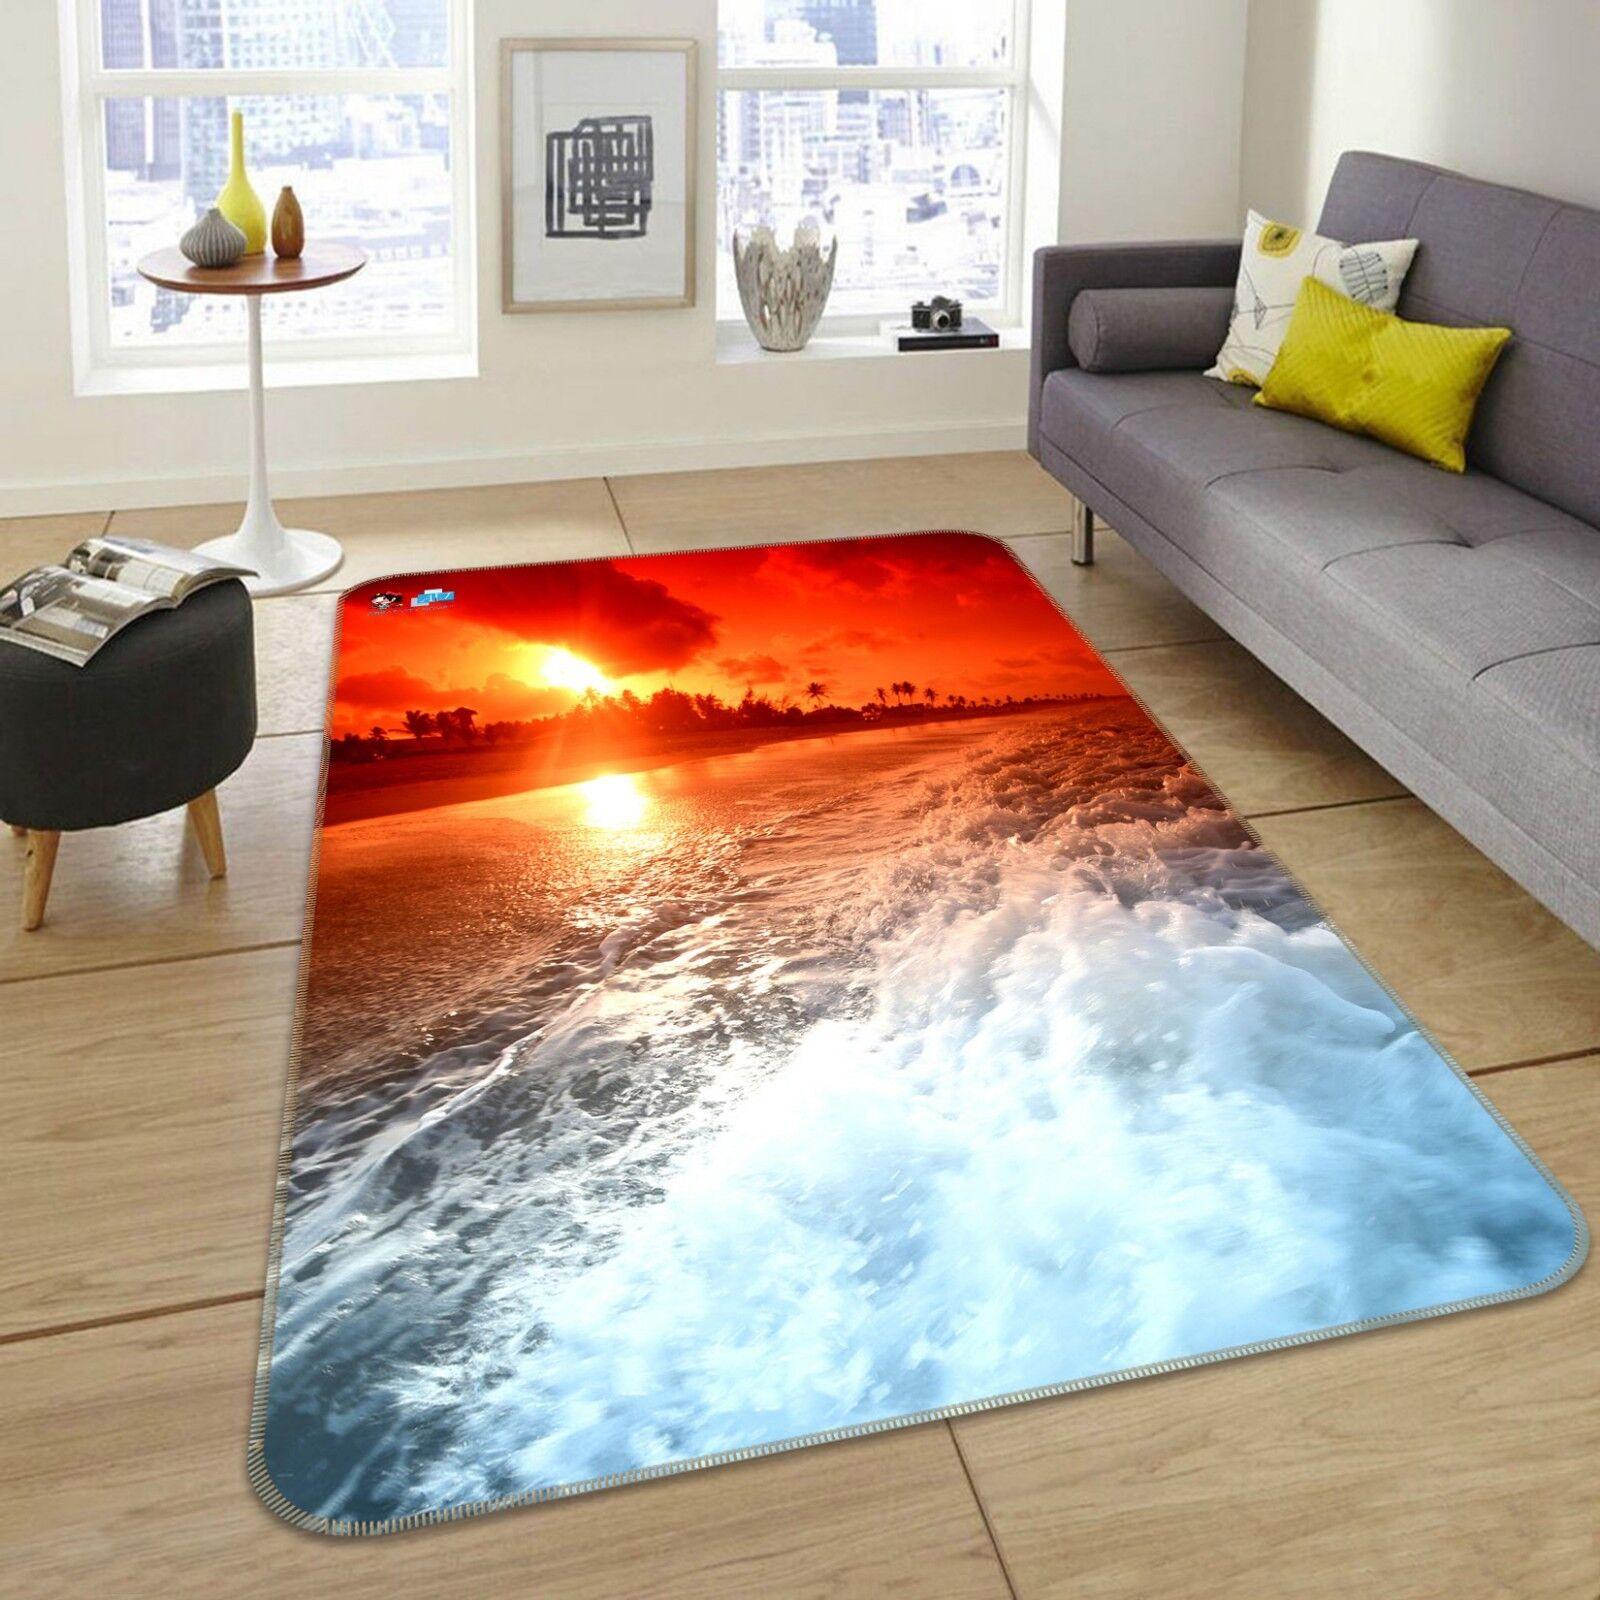 3D Painted Houses 6878 Non Slip Rug Mat Room Mat Quality Elegant Photo Carpet AU